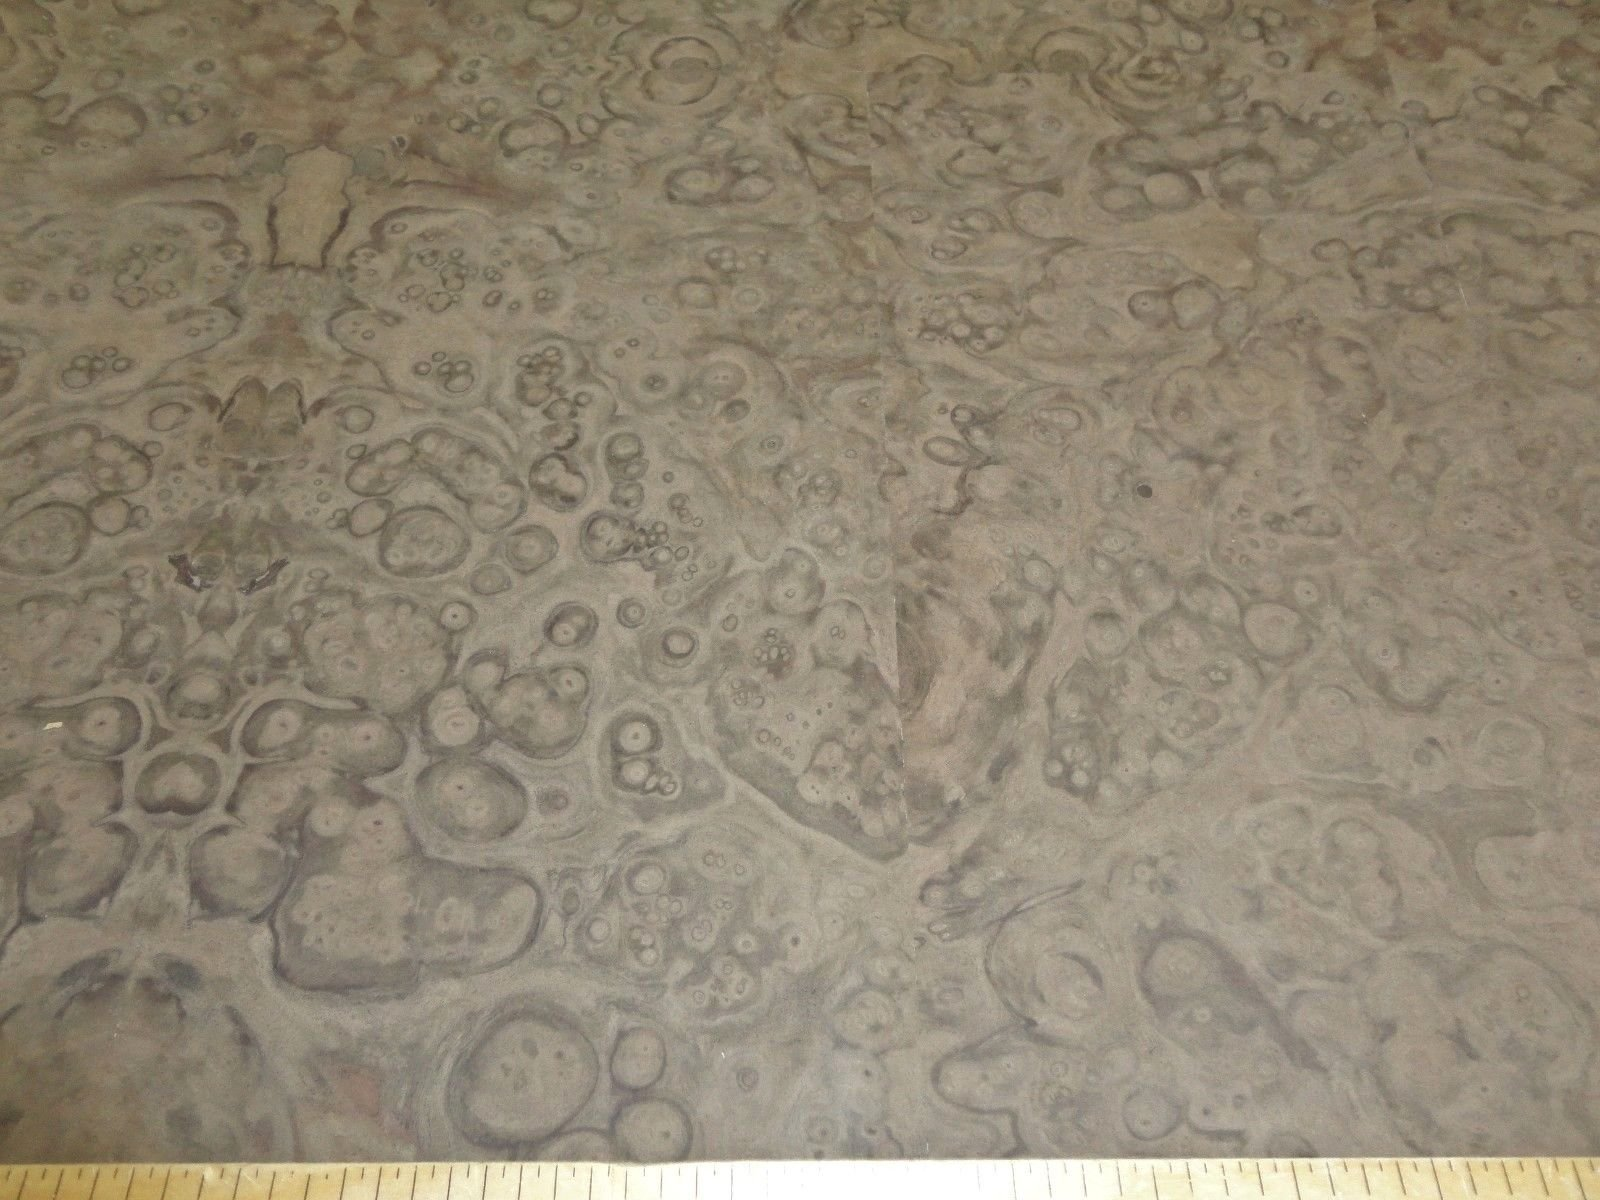 Walnut Burl wood veneer 24'' x 32'' with PSA peel stick adhesive AAA grade quality